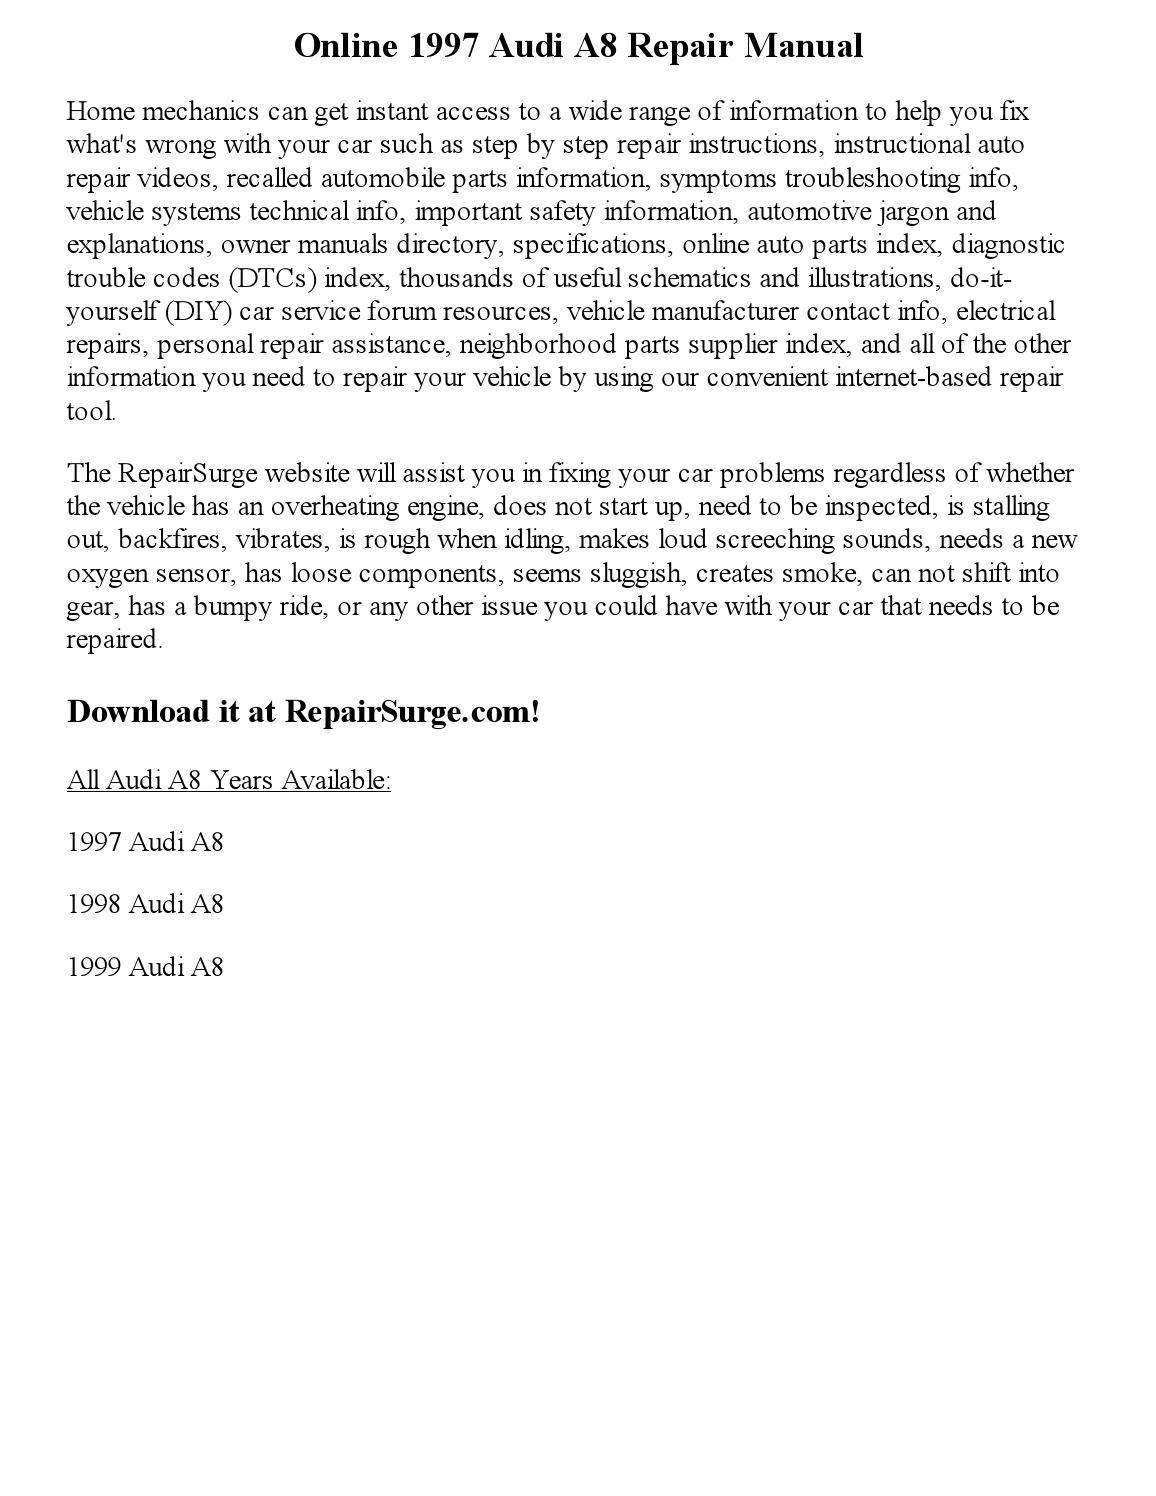 audi a8 owner u0027s manual 1999 Array - 1997 audi a8 repair manual online  by georgeblinkey issuu rh issuu ...